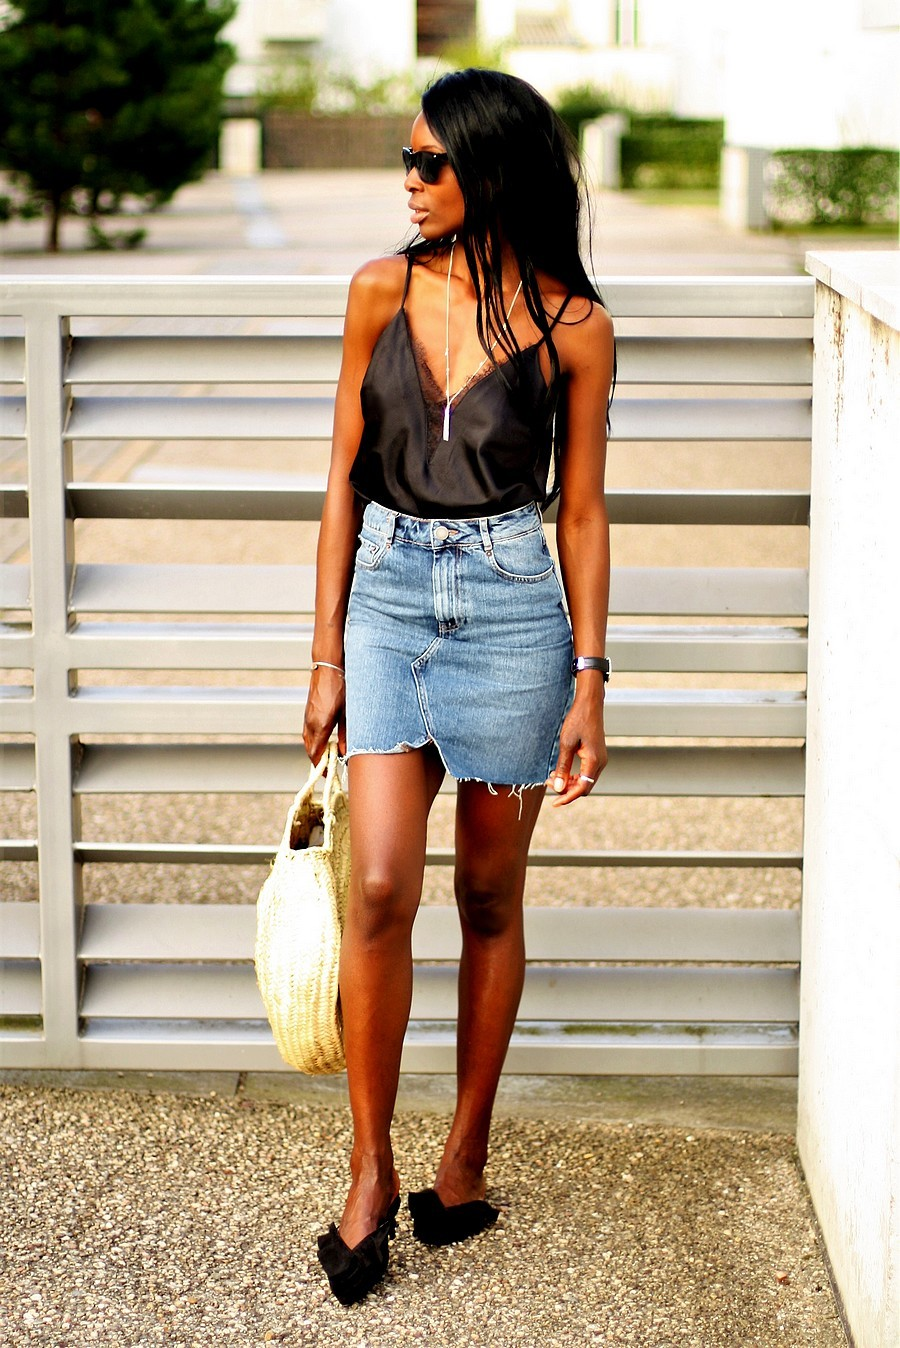 idee-look-tendance-avec-jupe-en-jeans-panier-rond-caraco-dentelle-satin